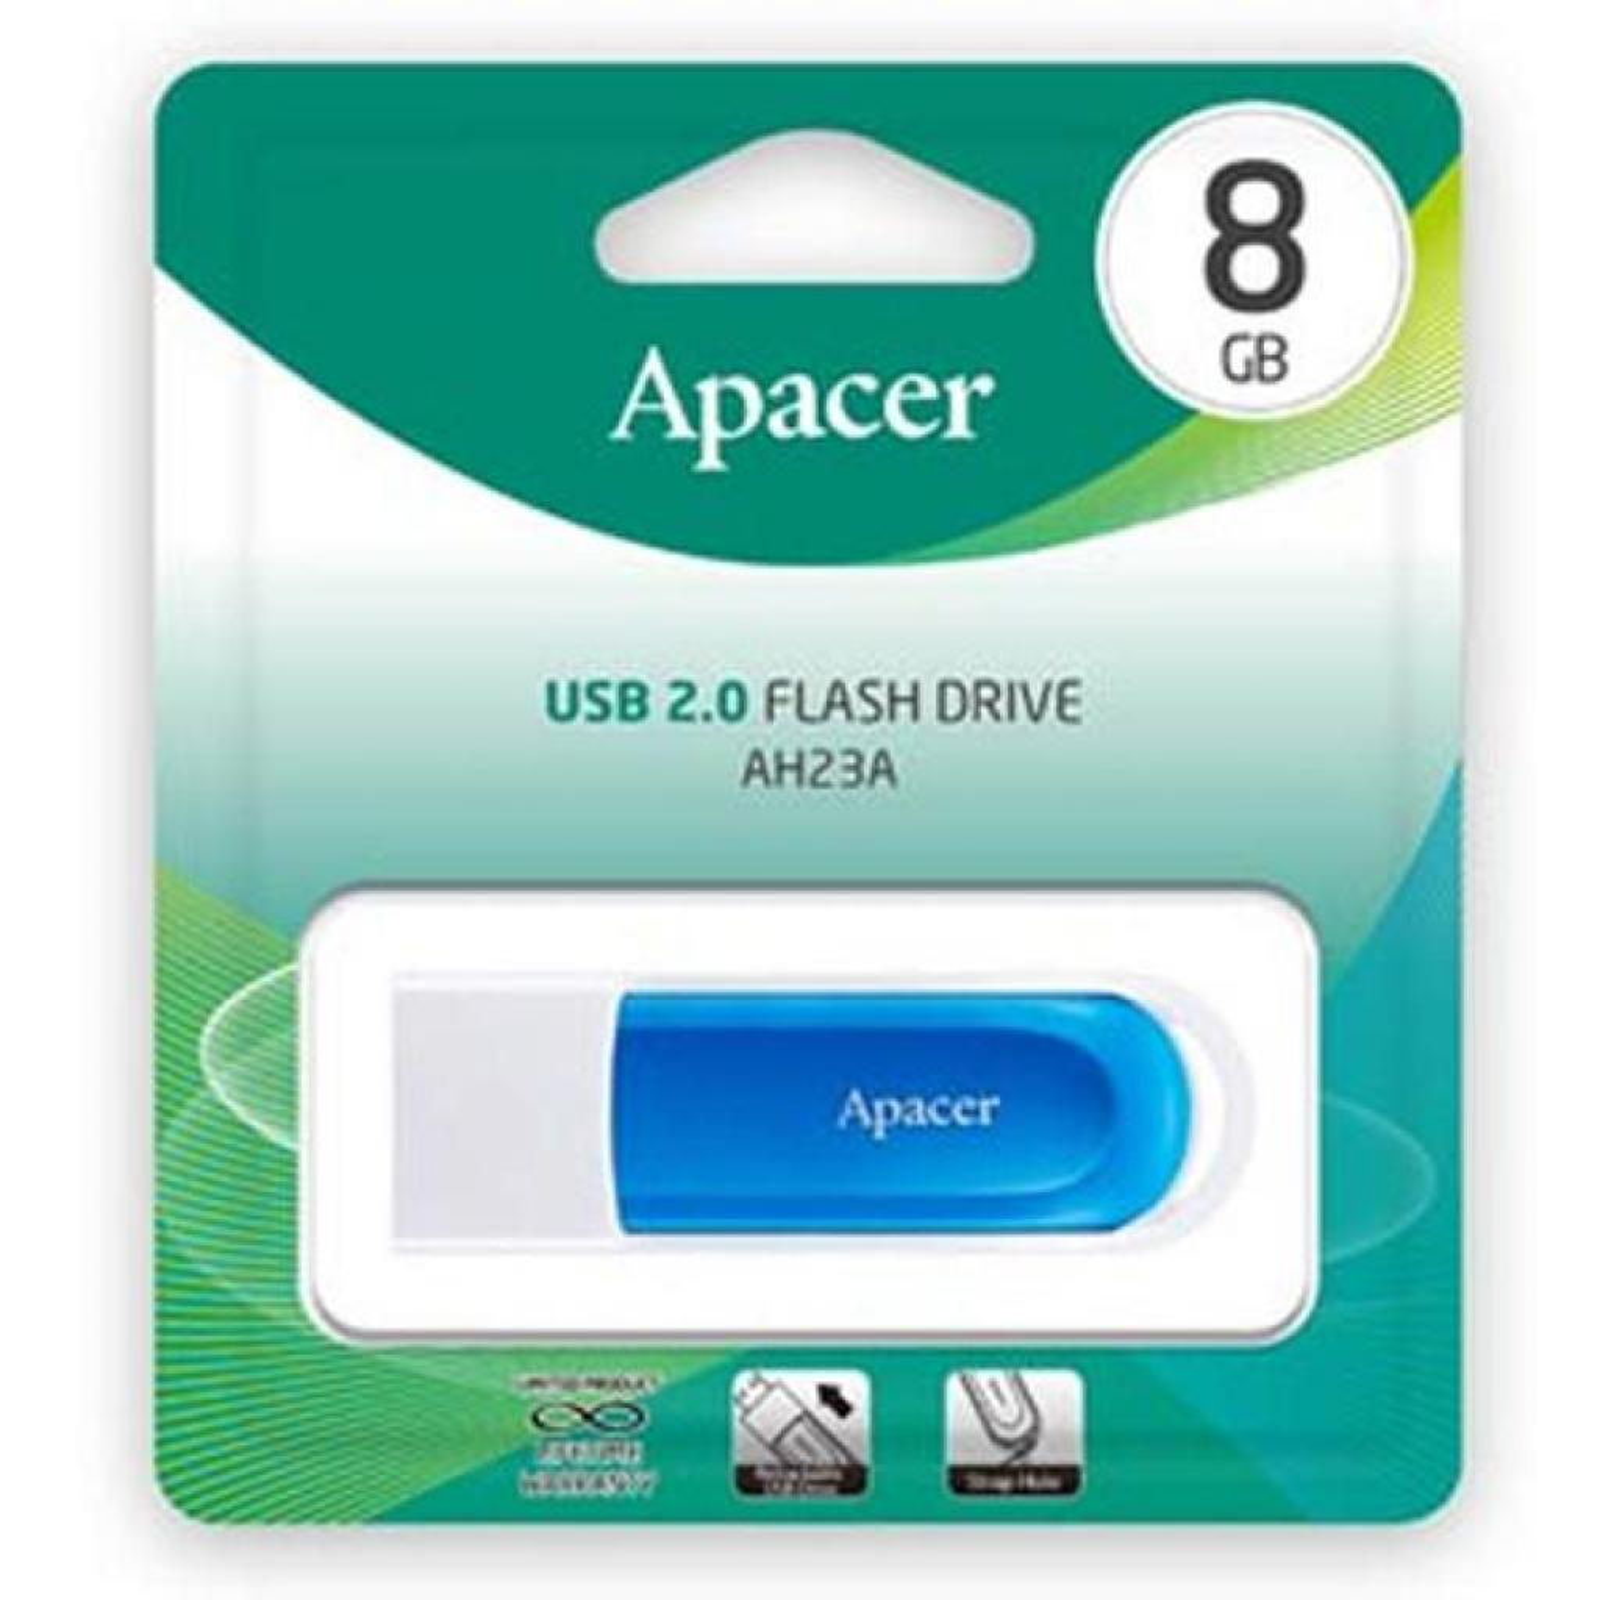 USB флеш накопитель Apacer 8GB AH23A White USB 2.0 (AP8GAH23AW-1) изображение 6